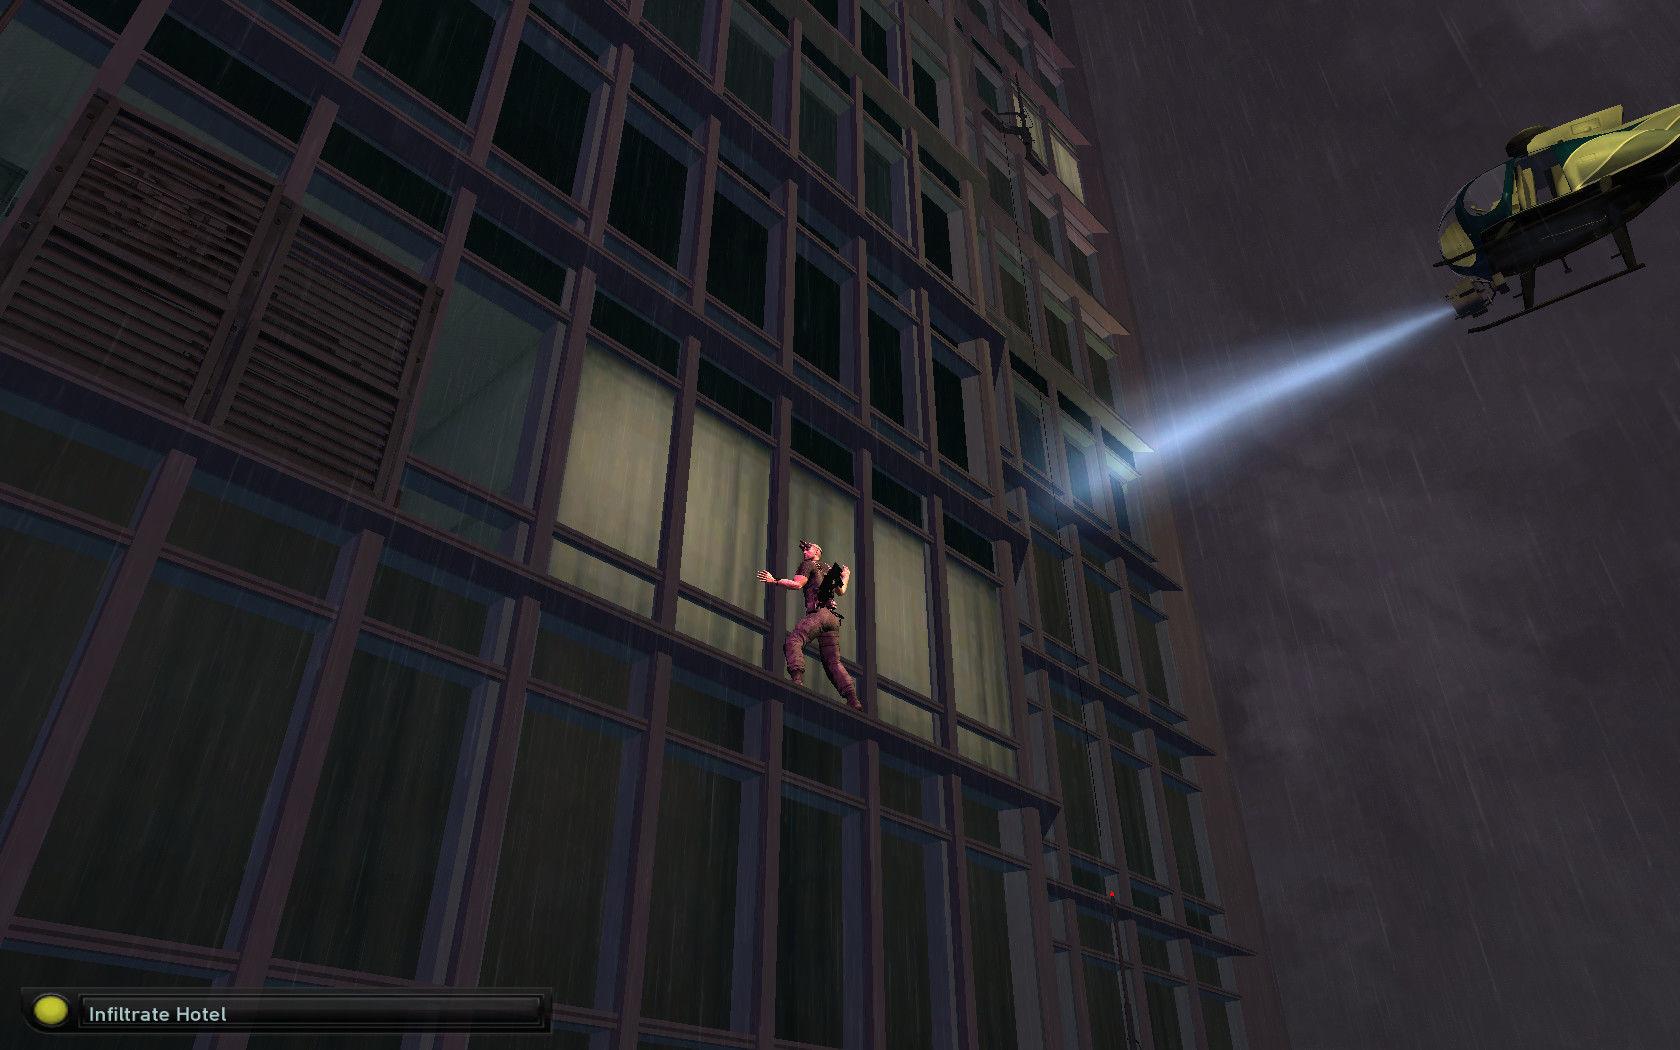 501970-tom-clancy-s-splinter-cell-double-agent-windows-screenshot